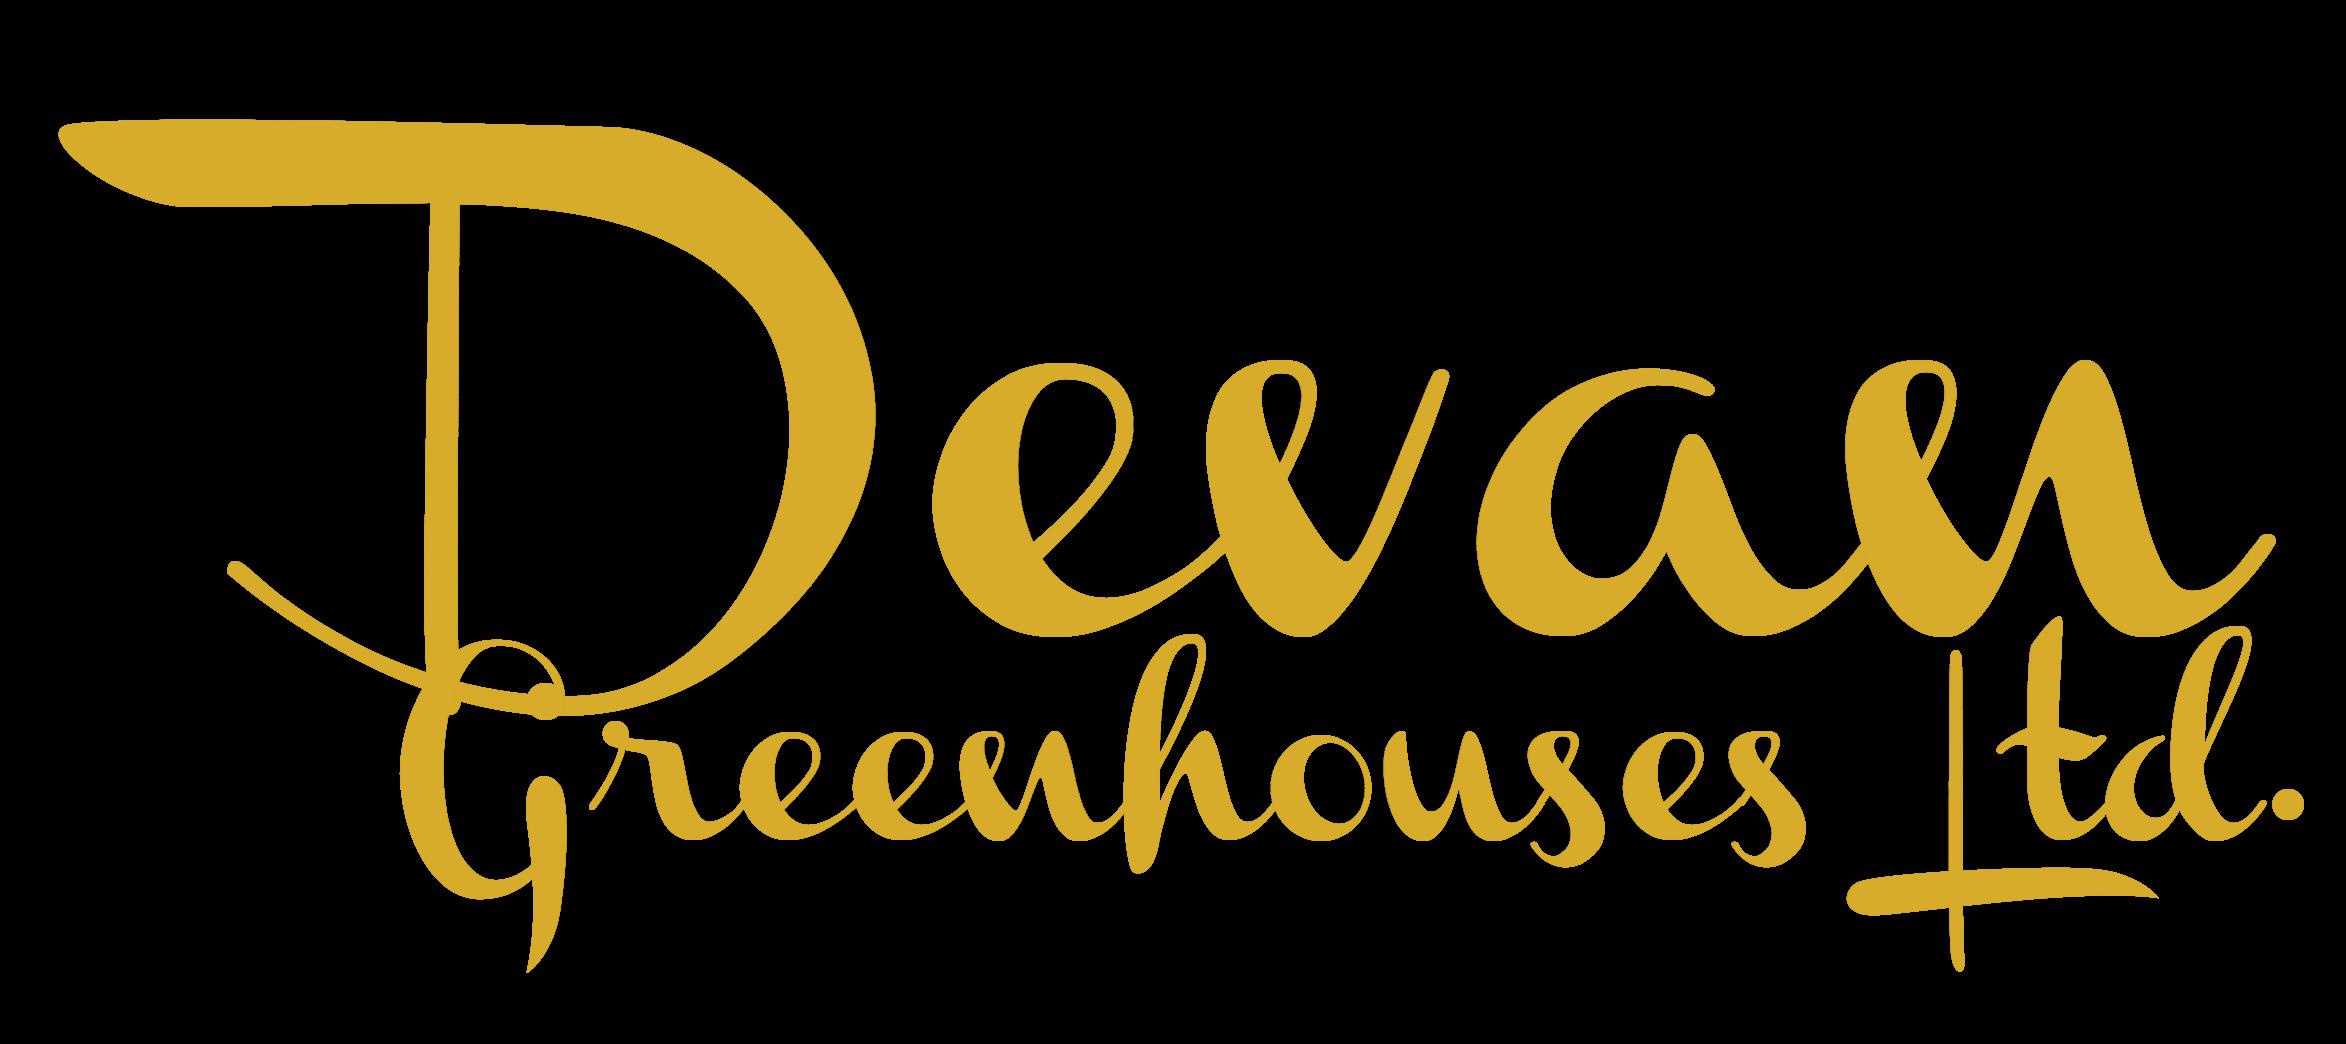 Devan Greenhouses Ltd.